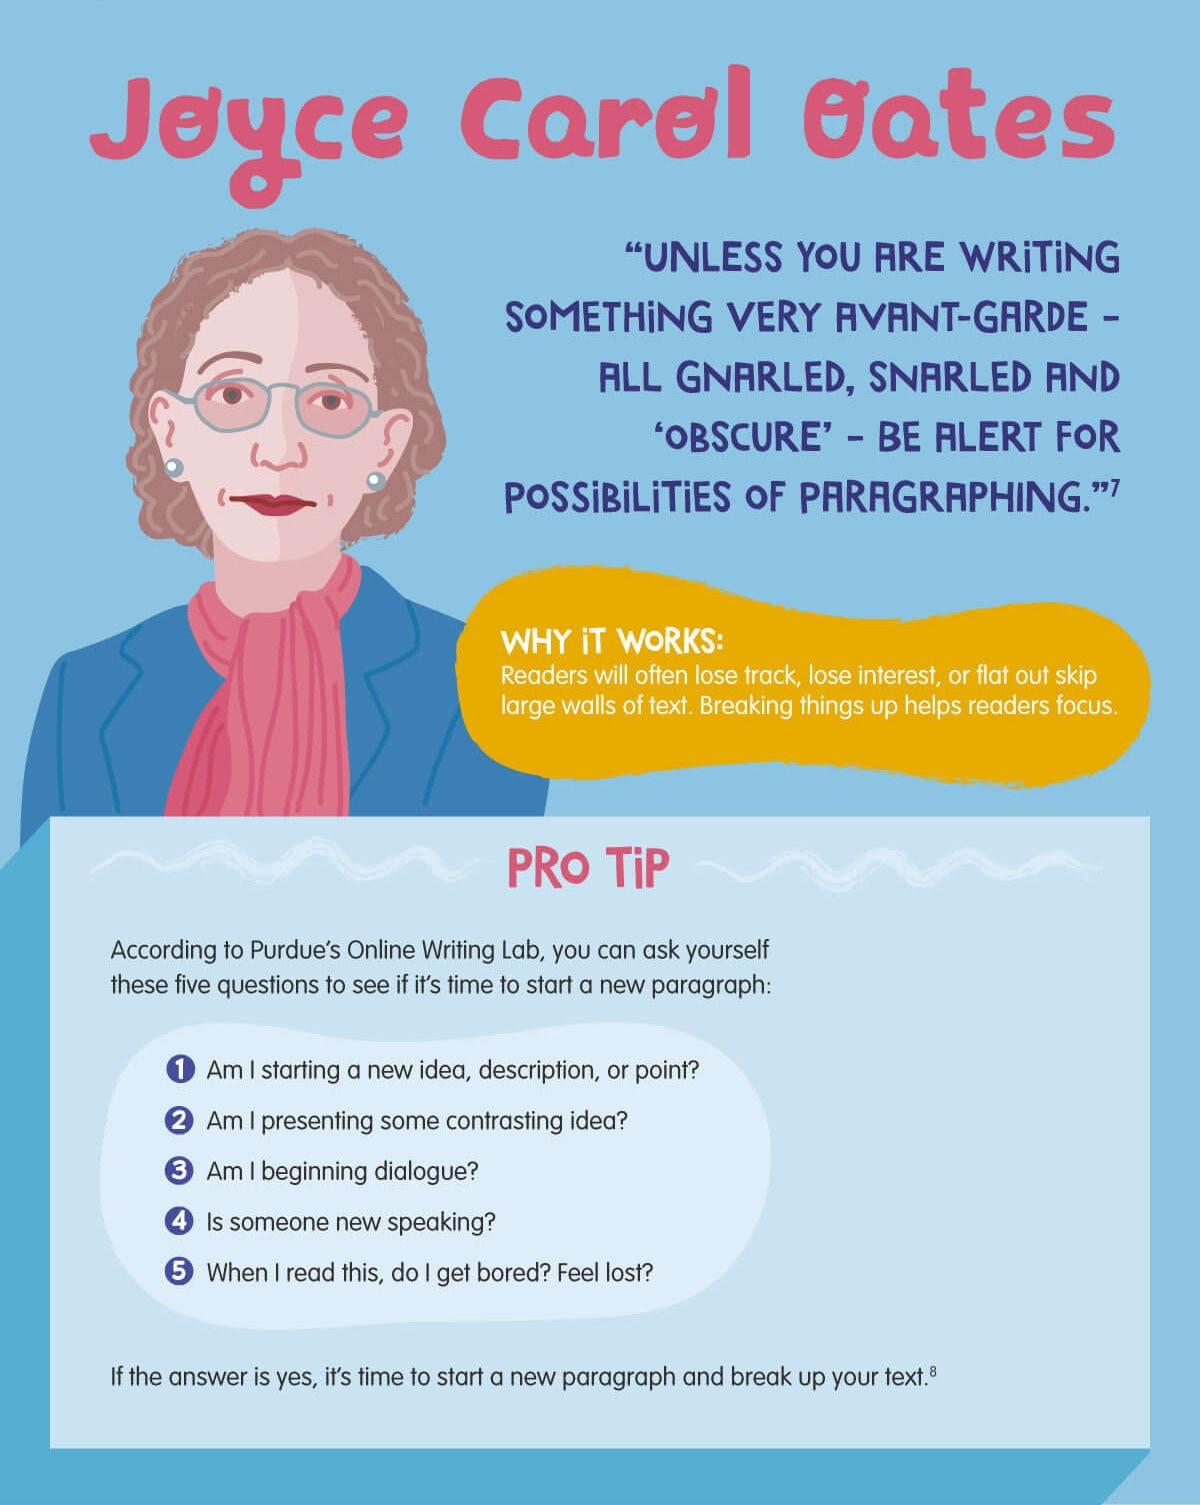 Writing tips from Joyce Carol Oates